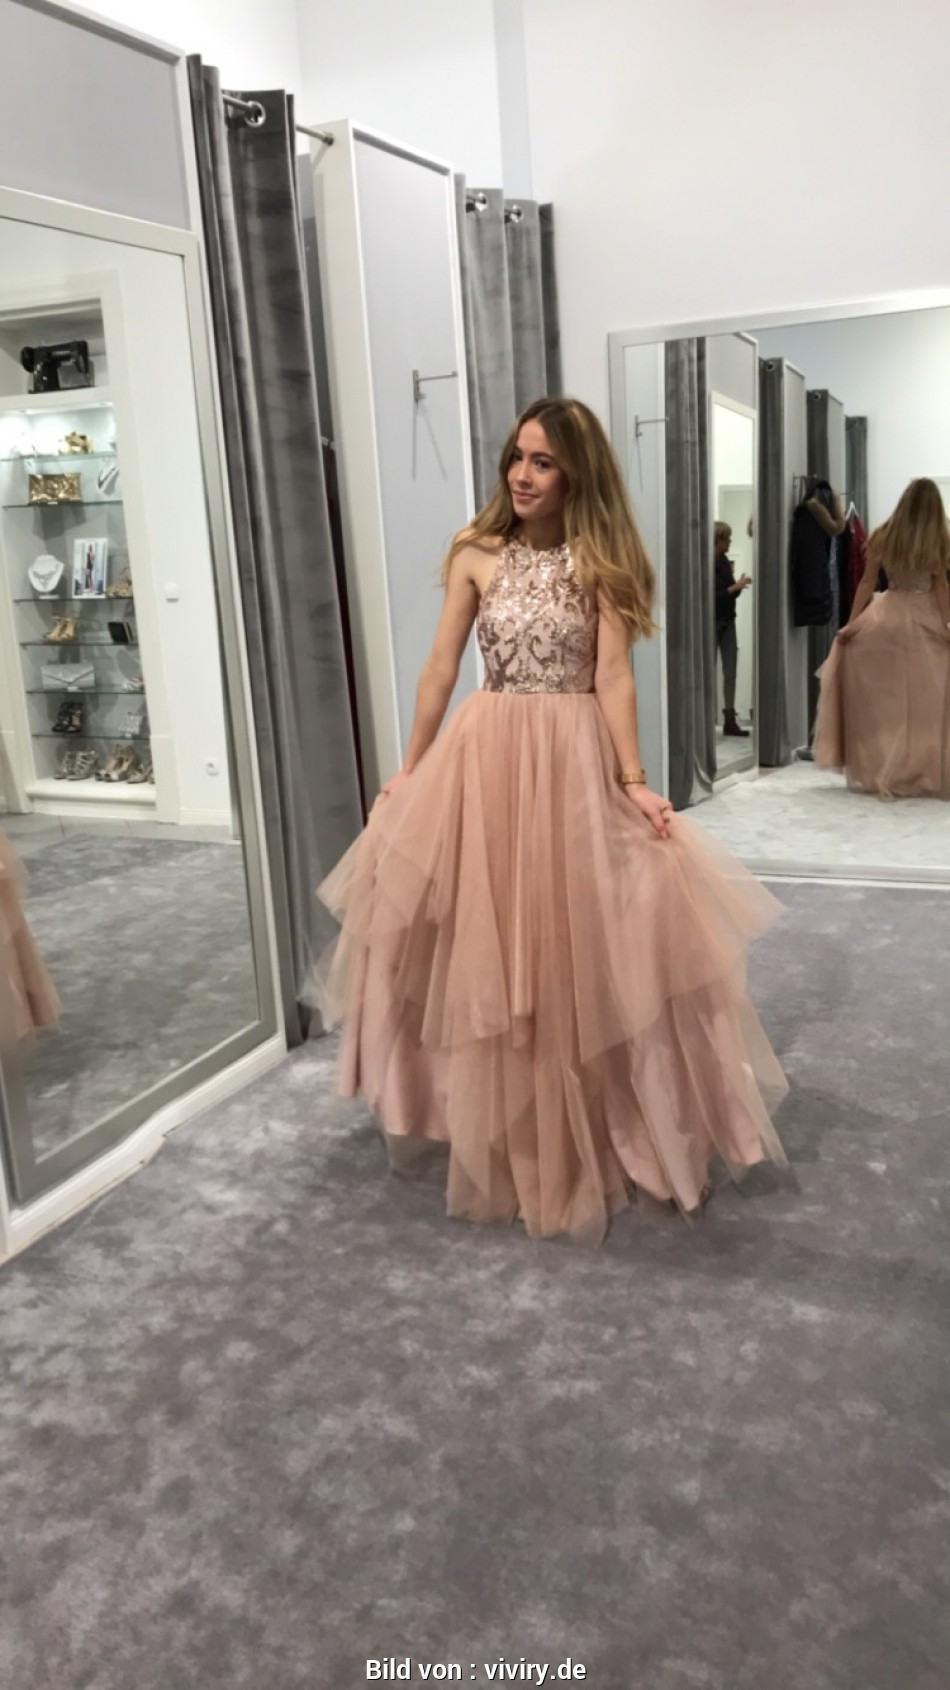 10 Wunderbar Abendkleider Viviry Vertrieb20 Coolste Abendkleider Viviry Spezialgebiet